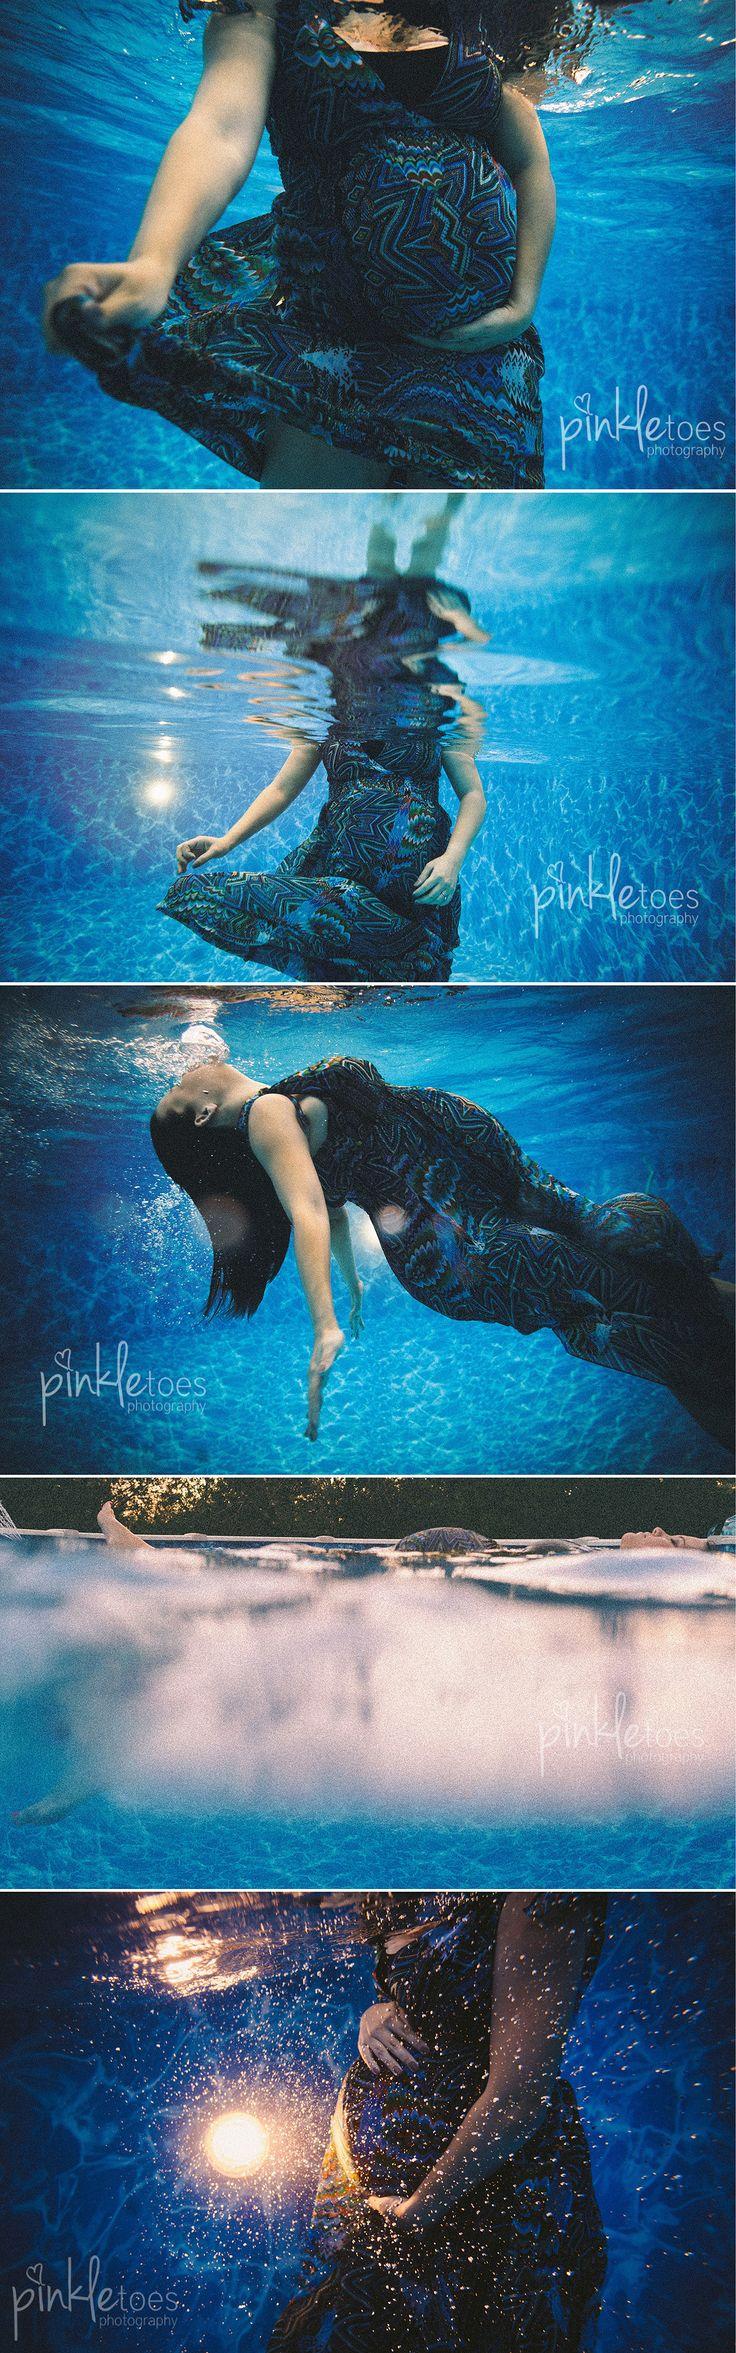 jm-austin-underwater-maternity-photography...